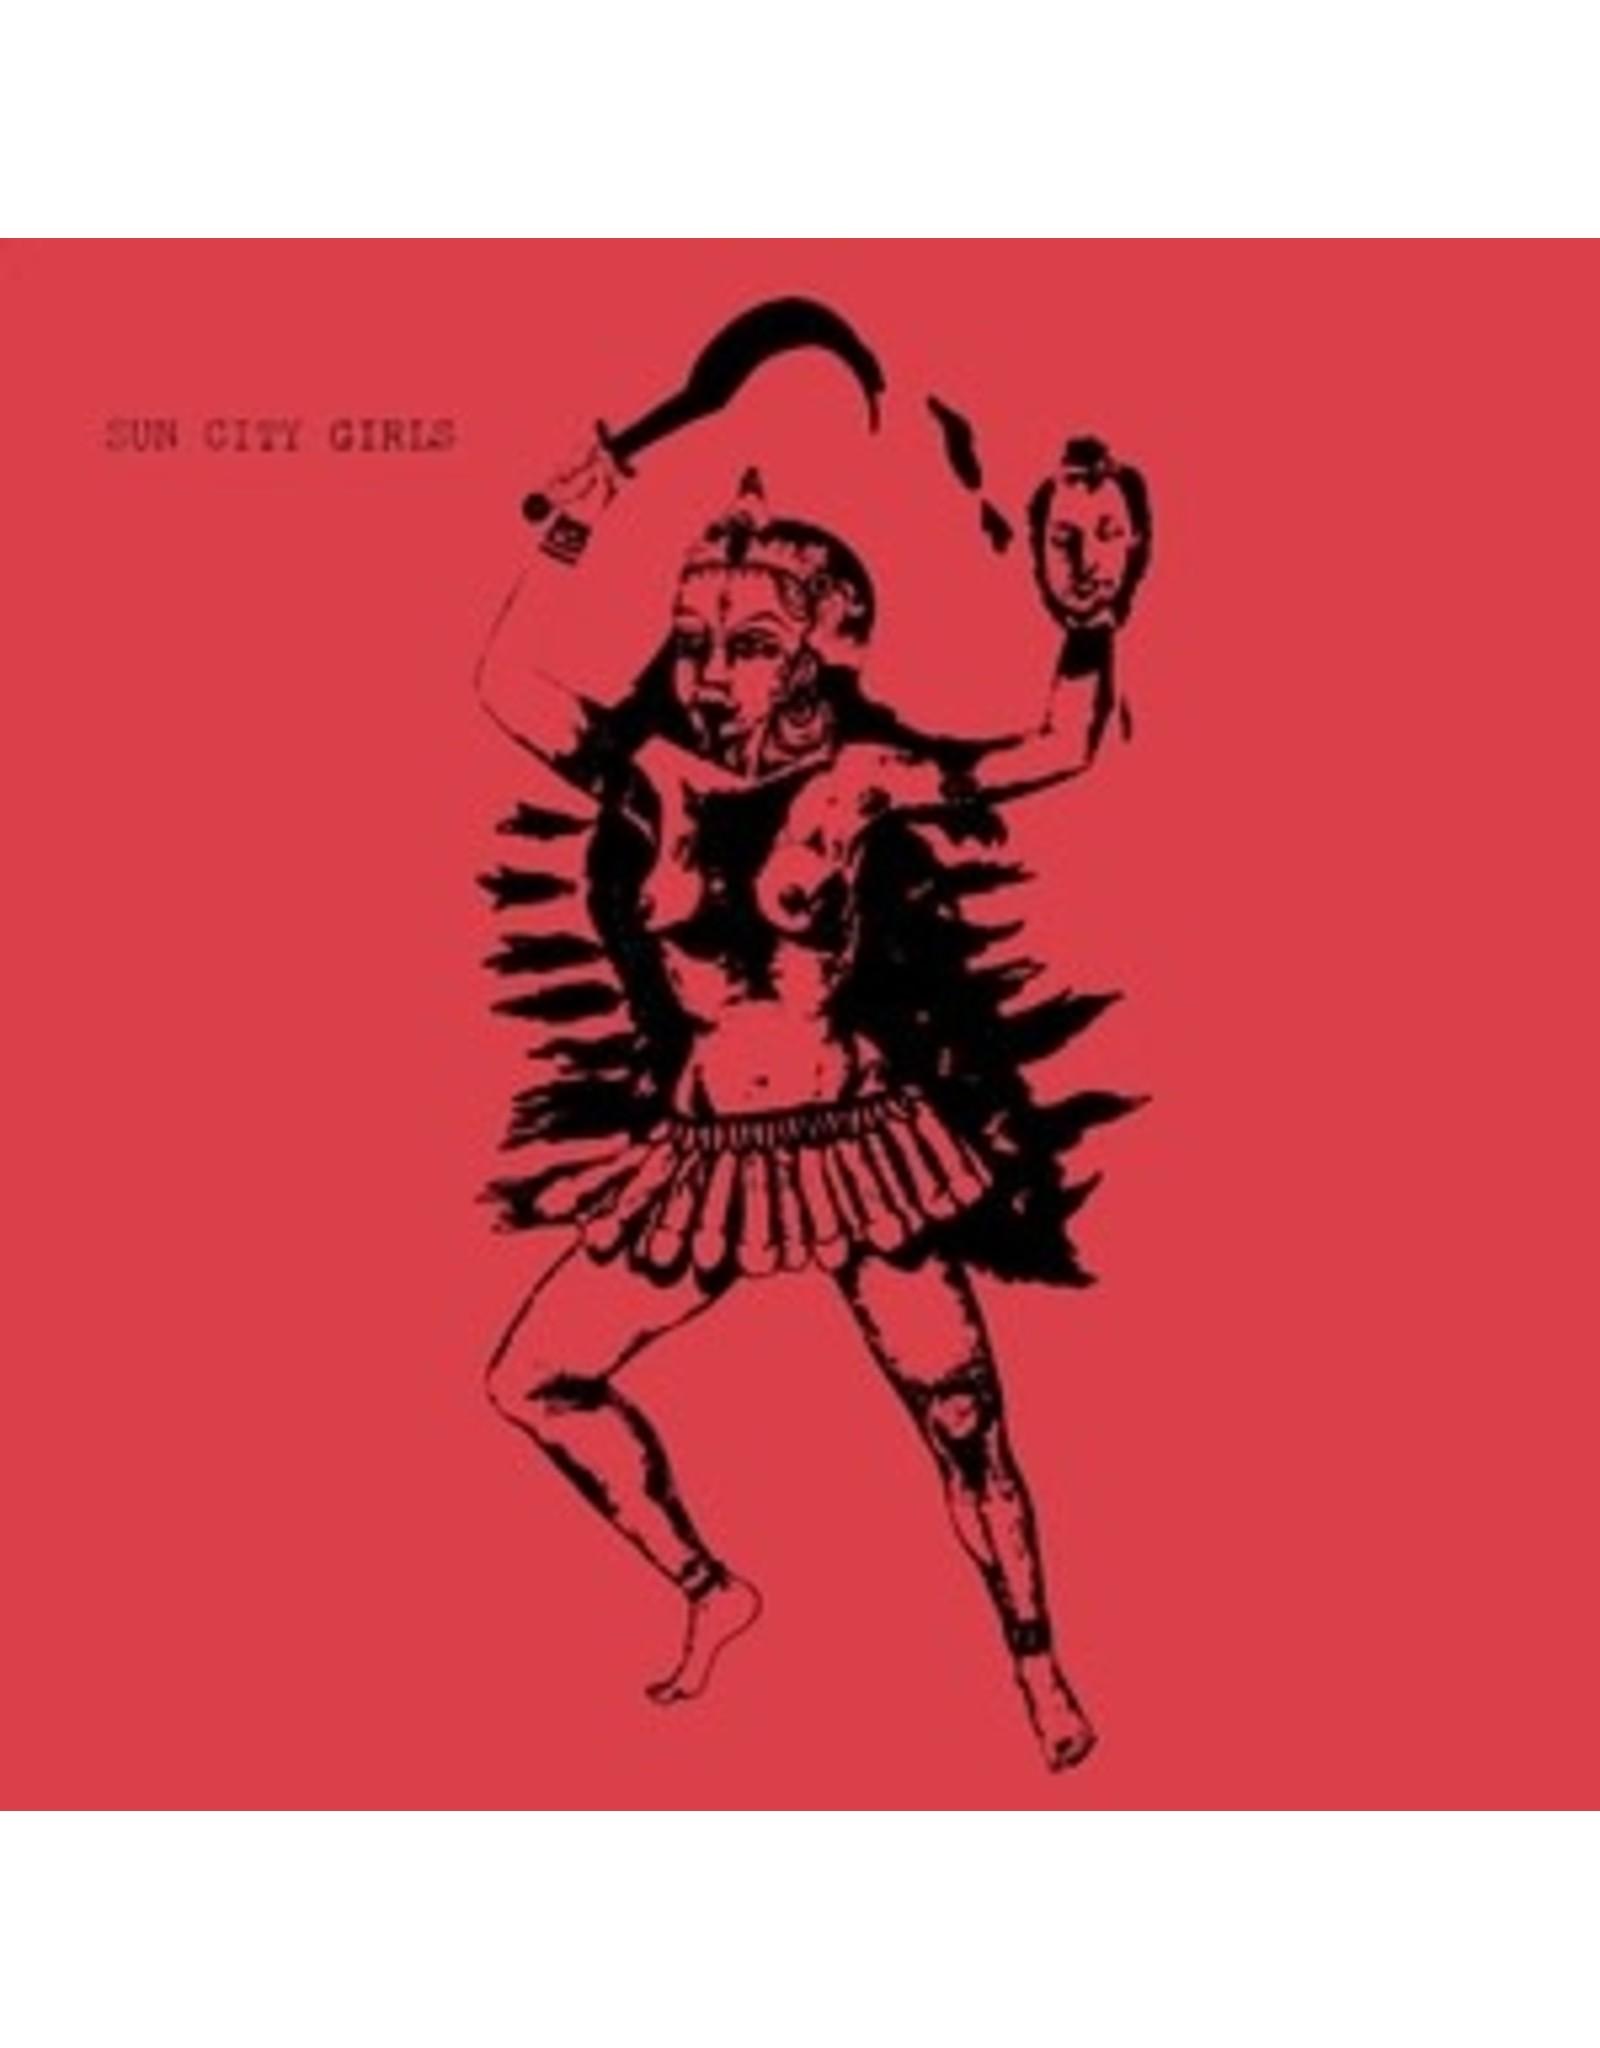 Abduction Sun City Girls: Dawn Of The Devi LP